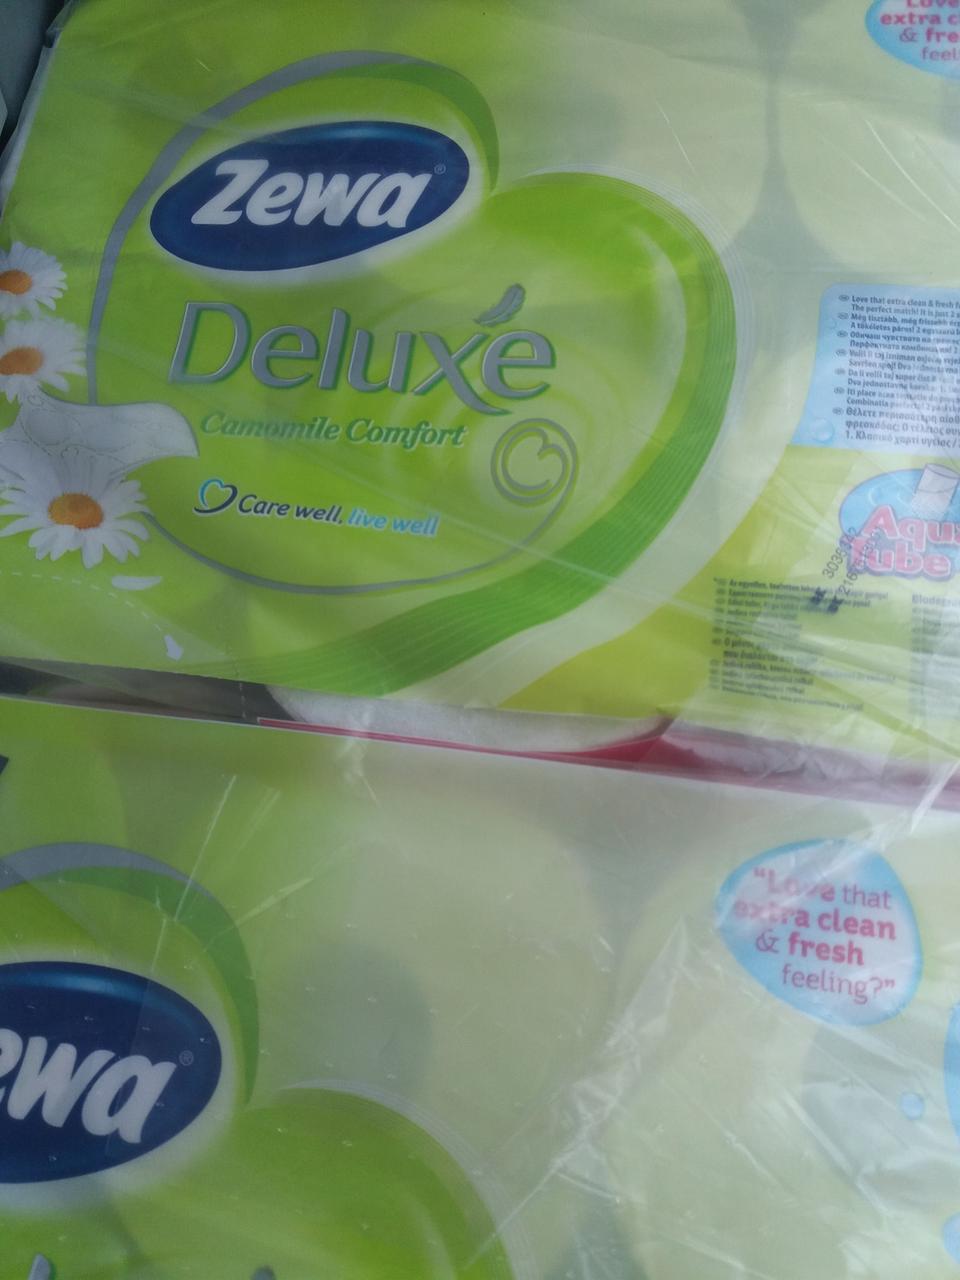 Туалетная бумага , Zewa Deluxe,16 рулонов, ароматизированная, Австрия ,Оригинал